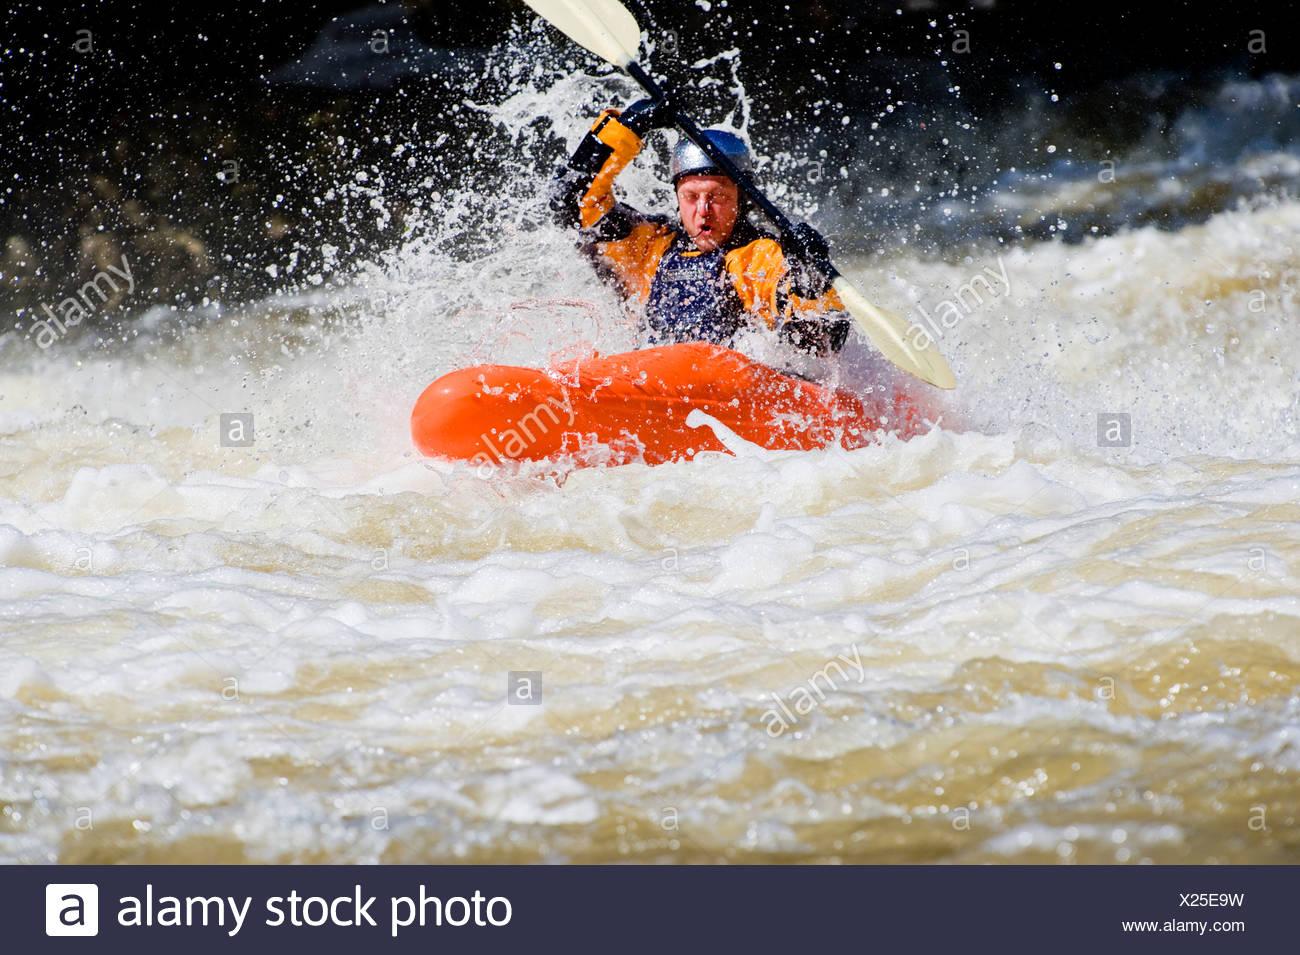 River Irvine Stock Photos & River Irvine Stock Images - Alamy